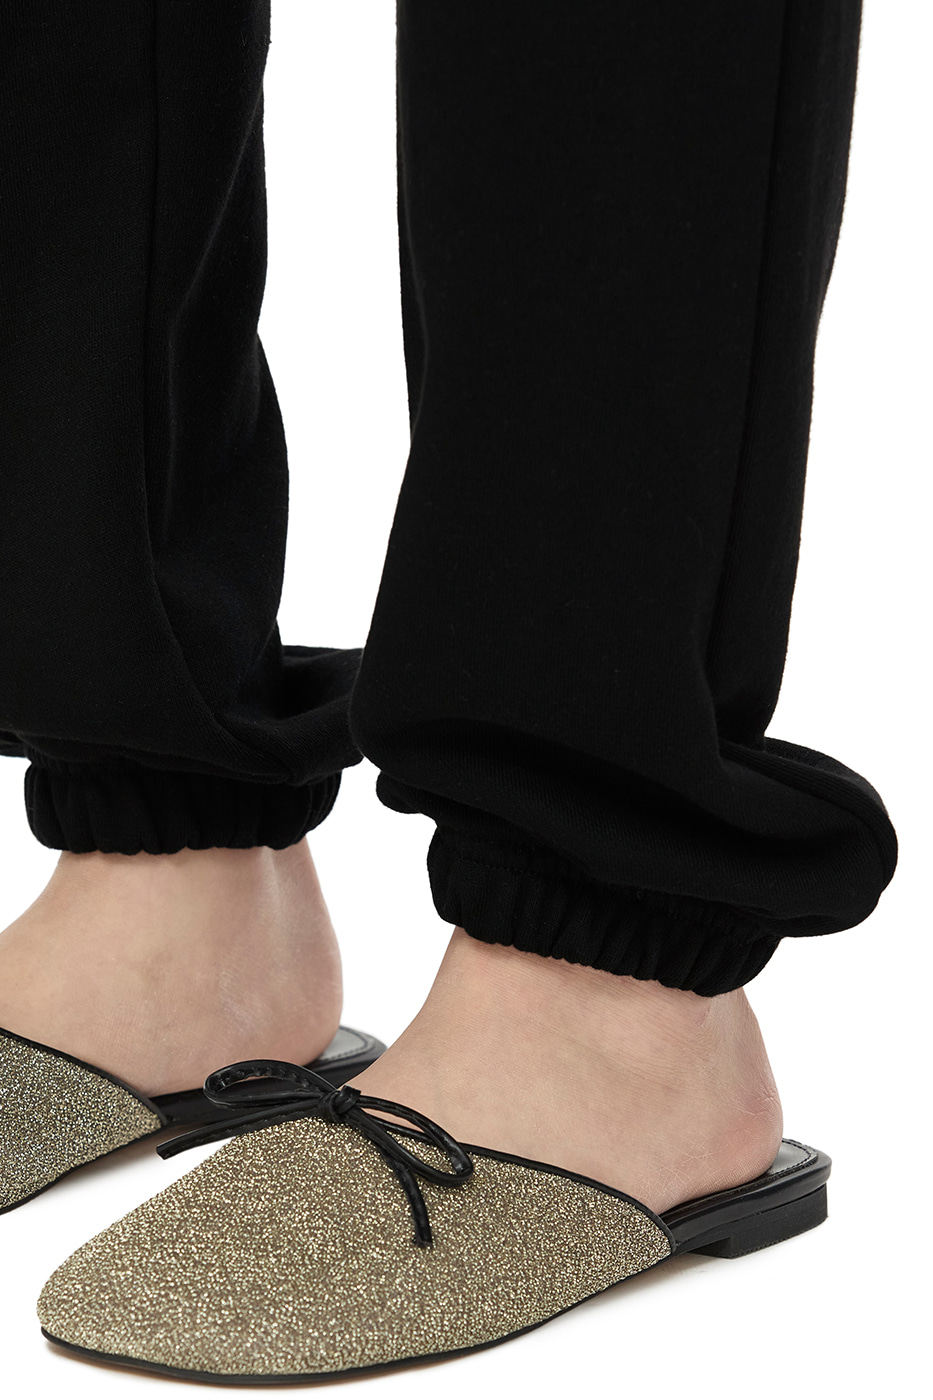 Jay pocket jogger trousers